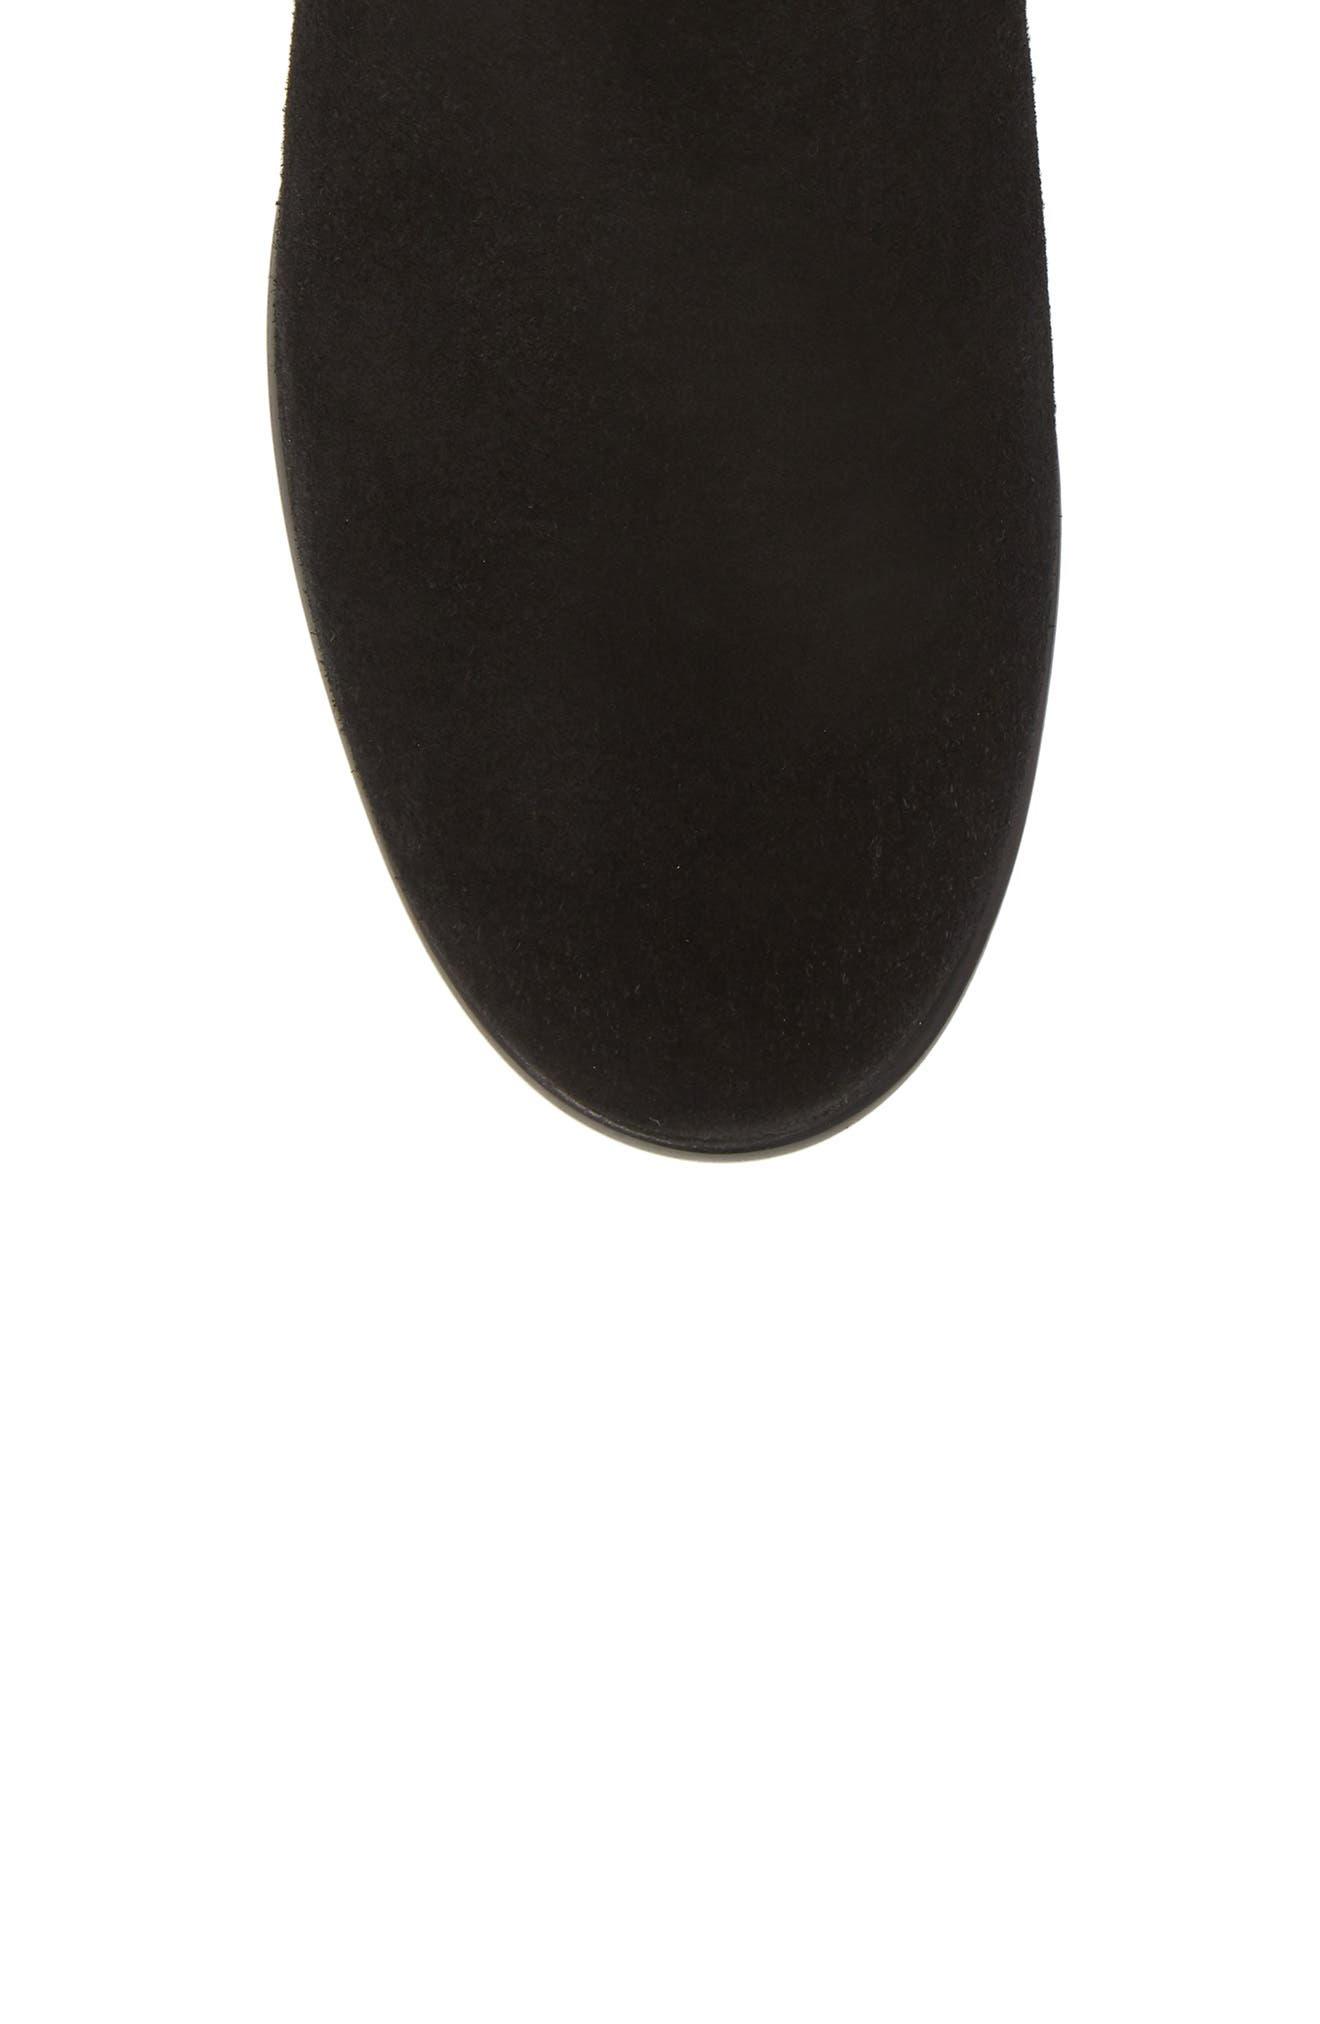 Sicilia Waterproof Boot,                             Alternate thumbnail 5, color,                             Black Suede